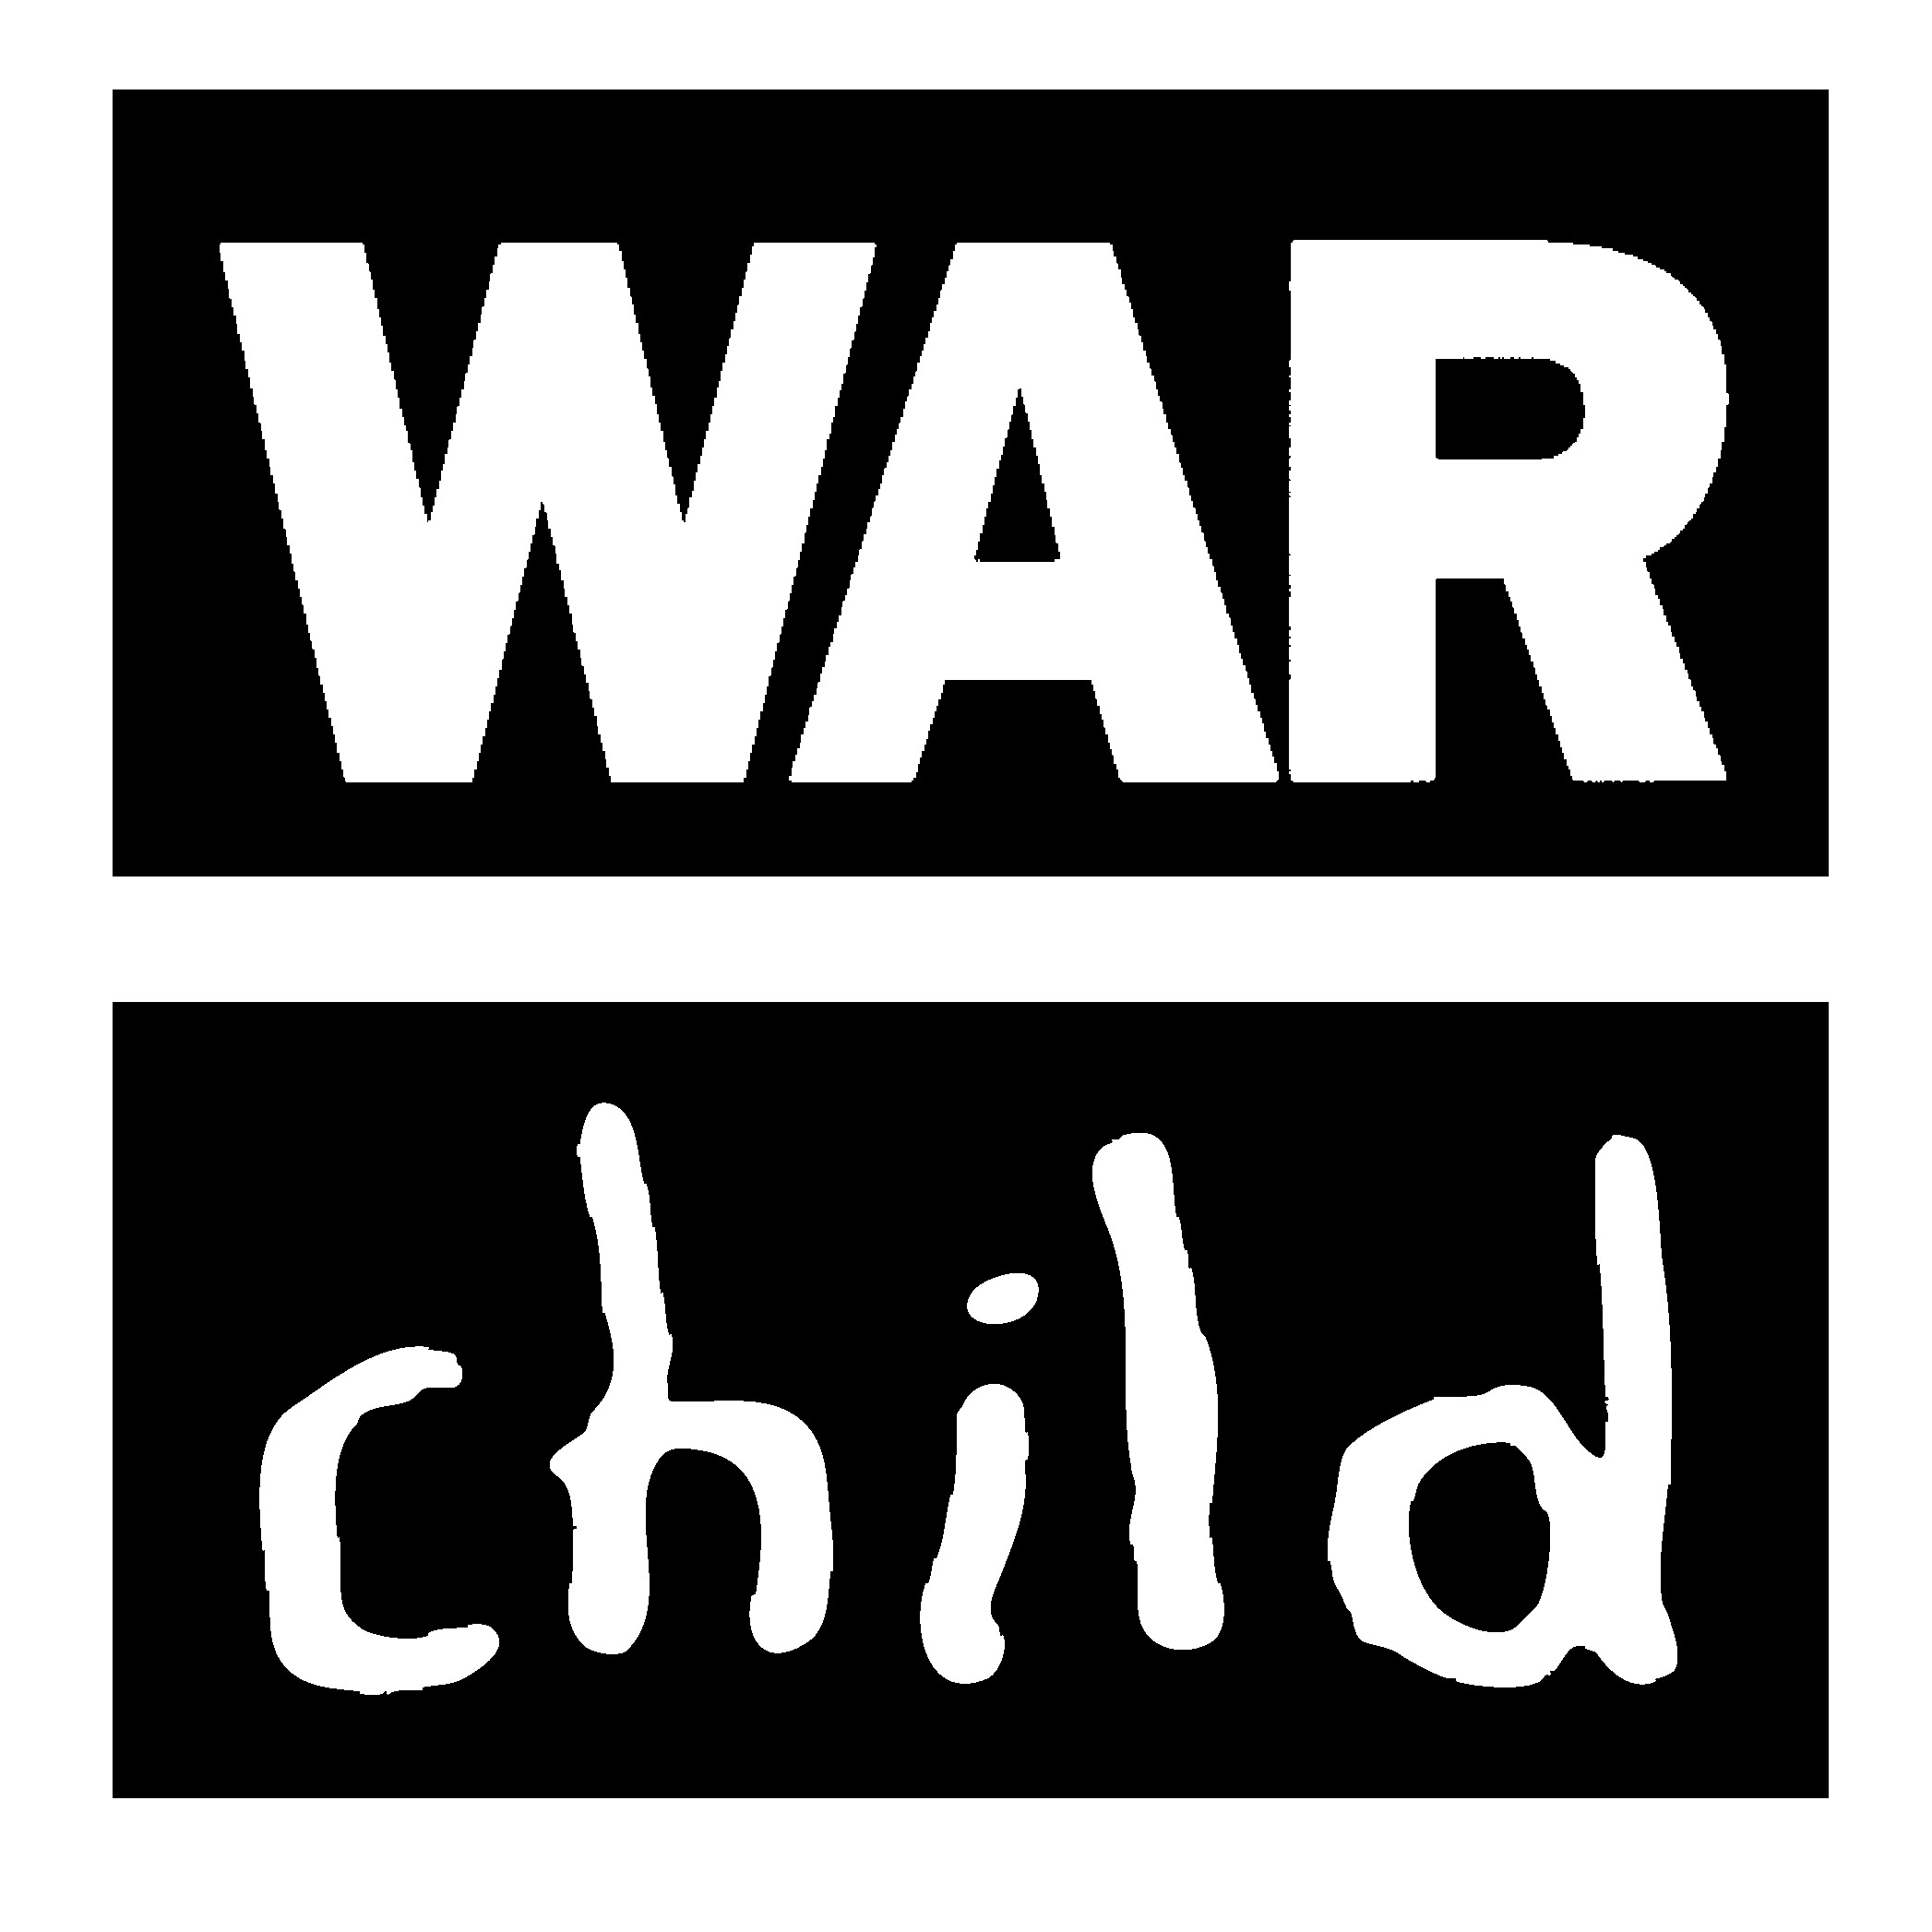 war-child-logo-black-and-white.jpg